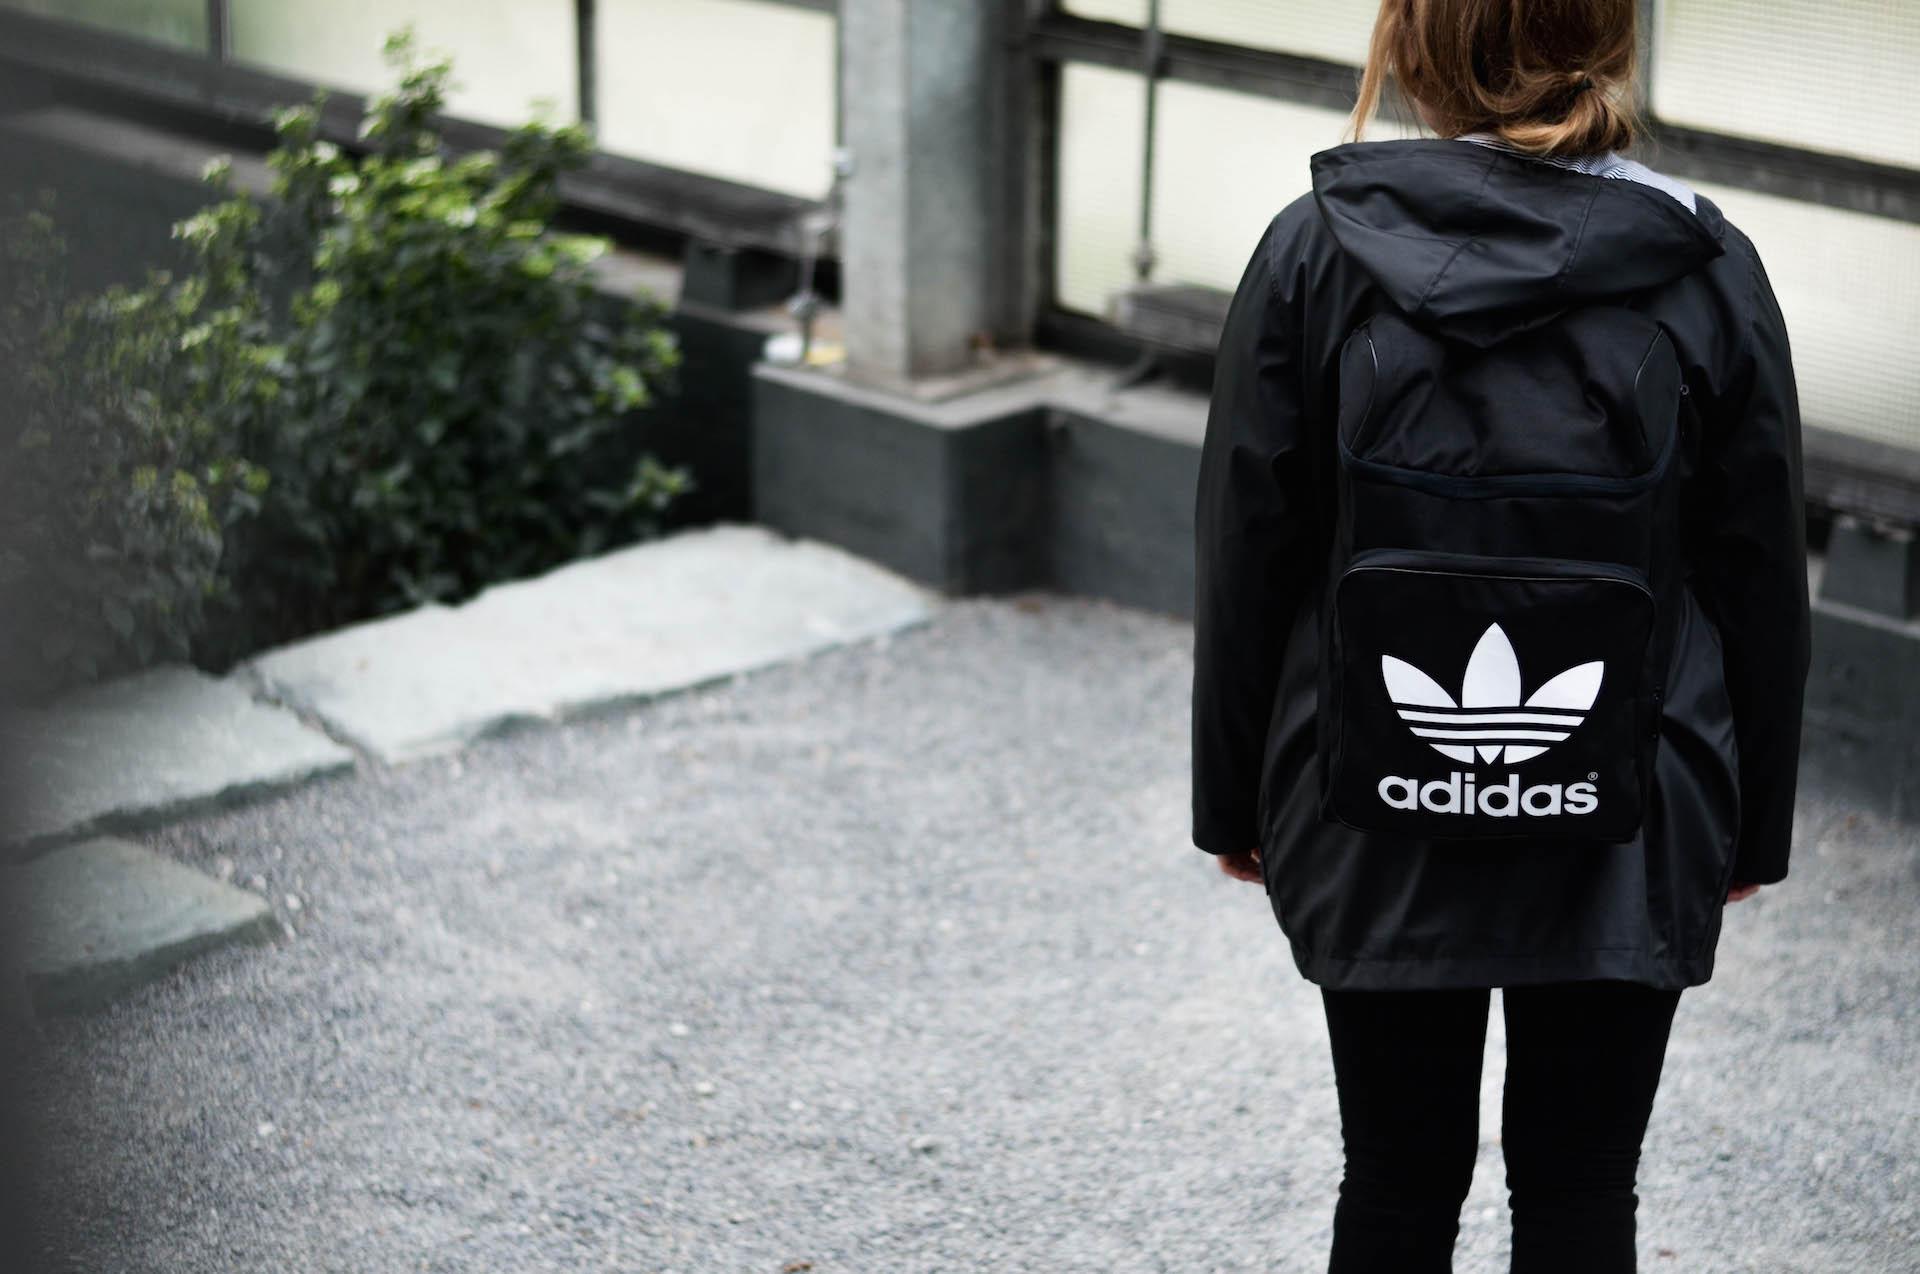 1d3d818183ae5 ✓ Adidas Originals Rucksack - Das Outfit auf todayis.de